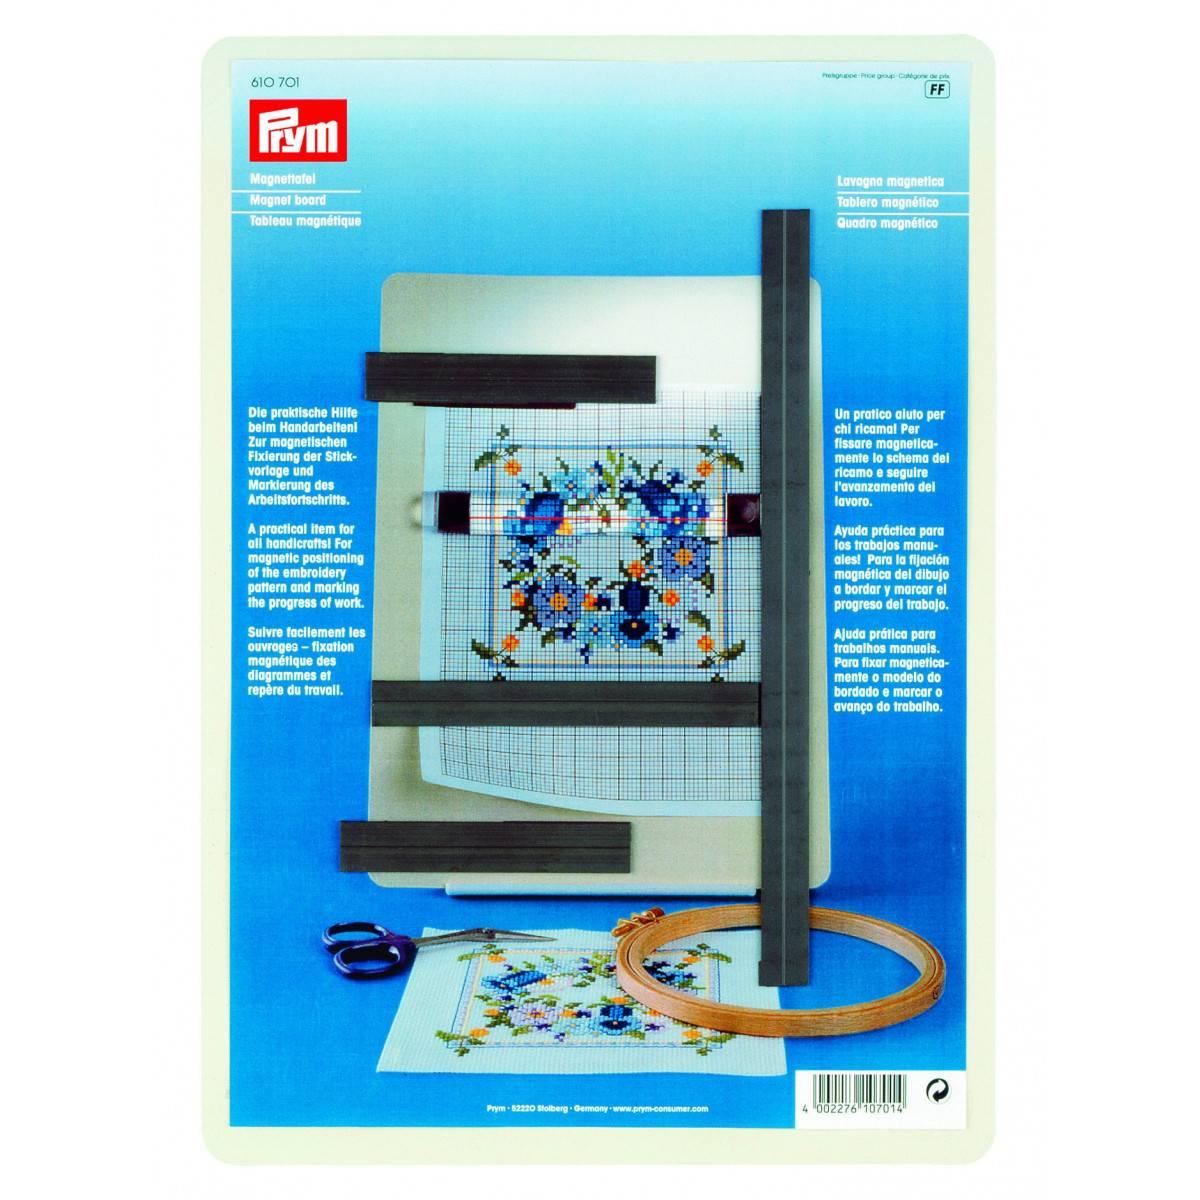 Prym Magnetbord 610701